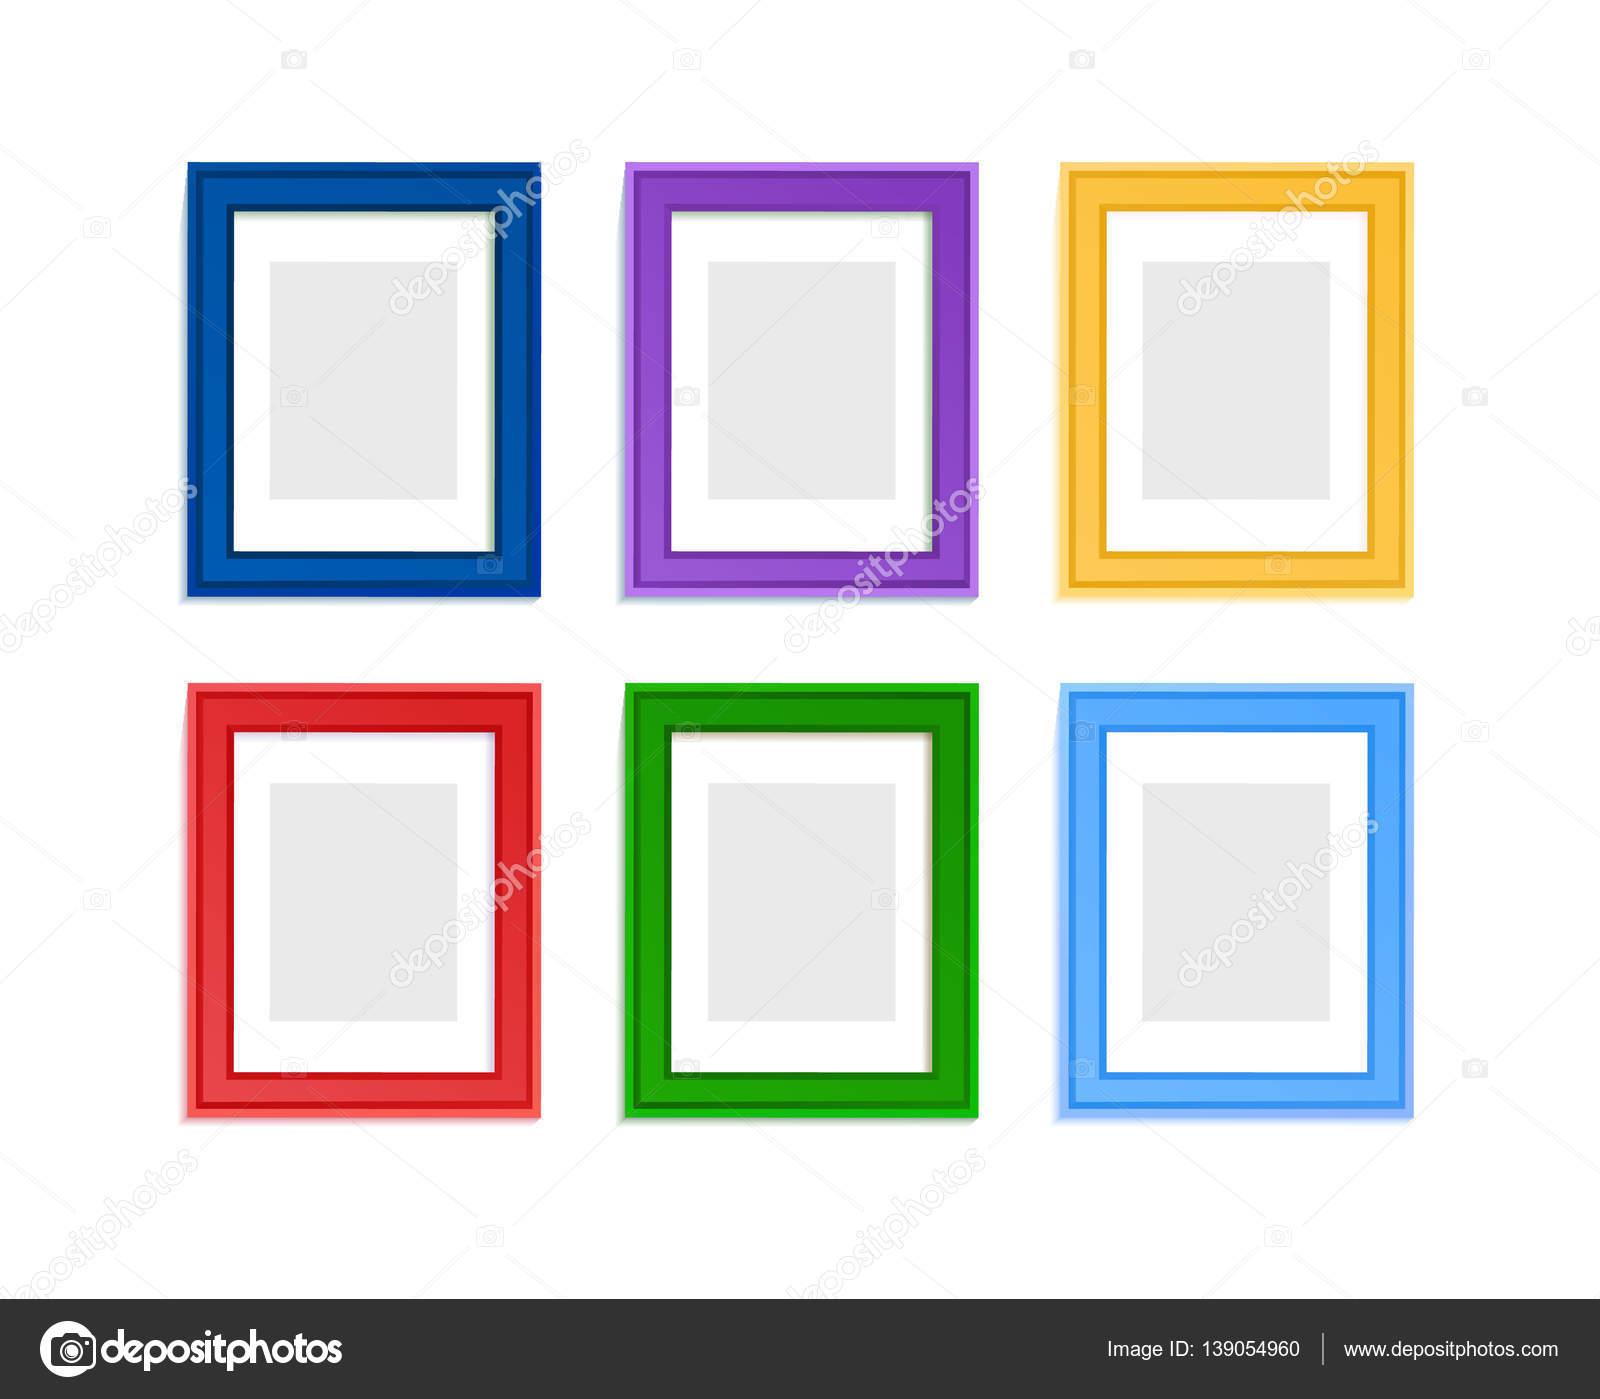 farbige Bilderrahmen — Stockvektor © Liubou #139054960